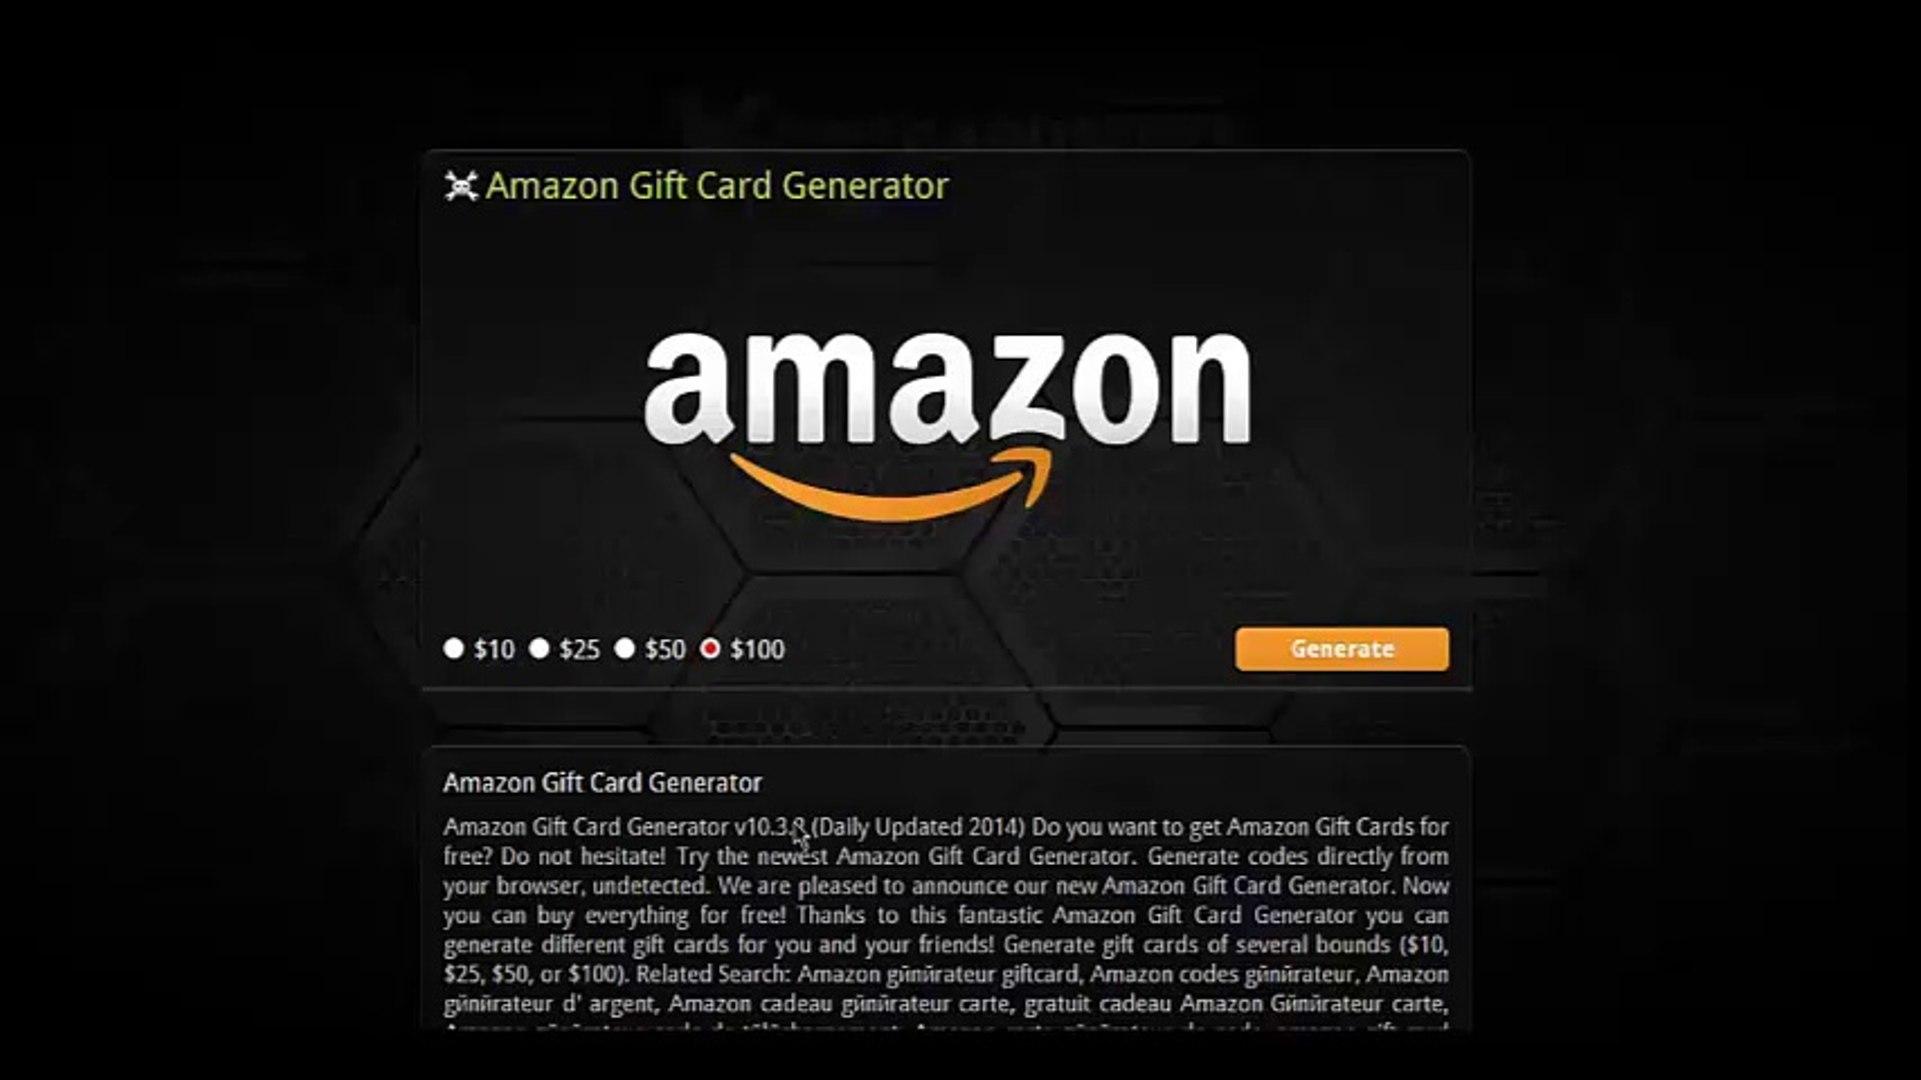 Gratuit Amazon Cartes Cadeaux Generateur Telecharger Free Amazon Gift Card Code Generator 2015 Video Dailymotion